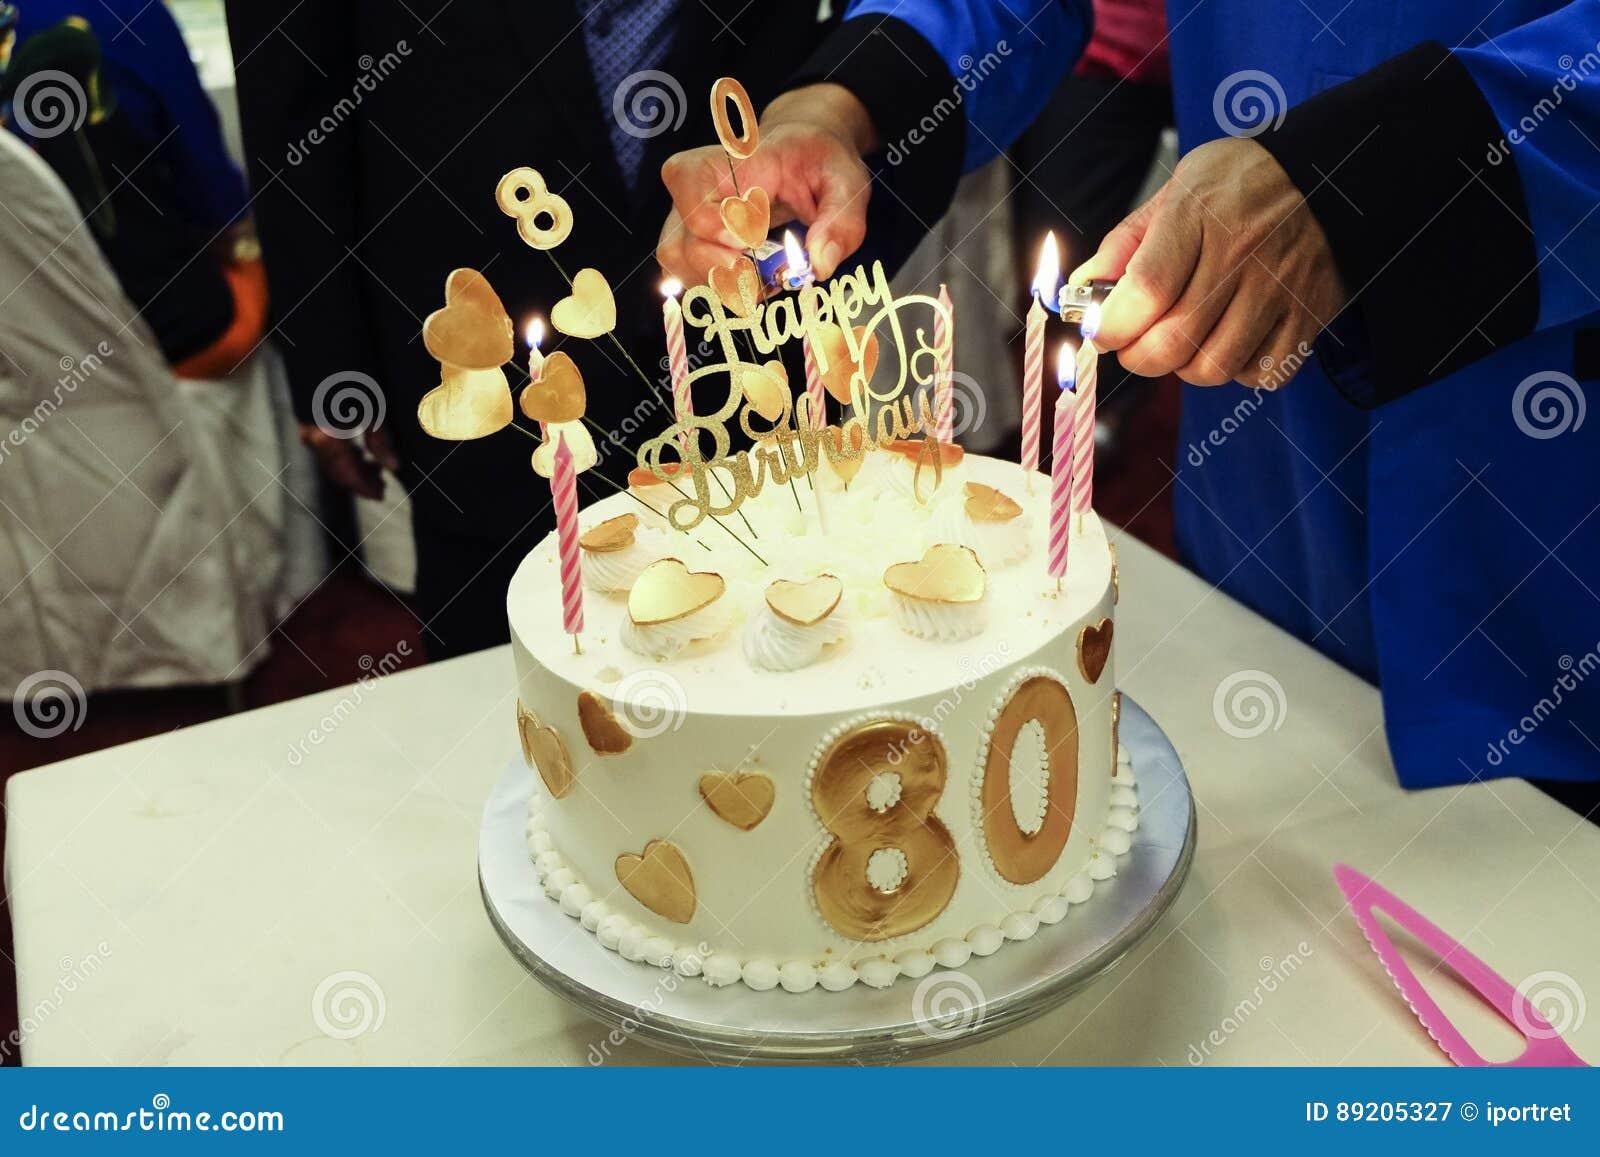 Lighting Up Candles On Birthday Cake